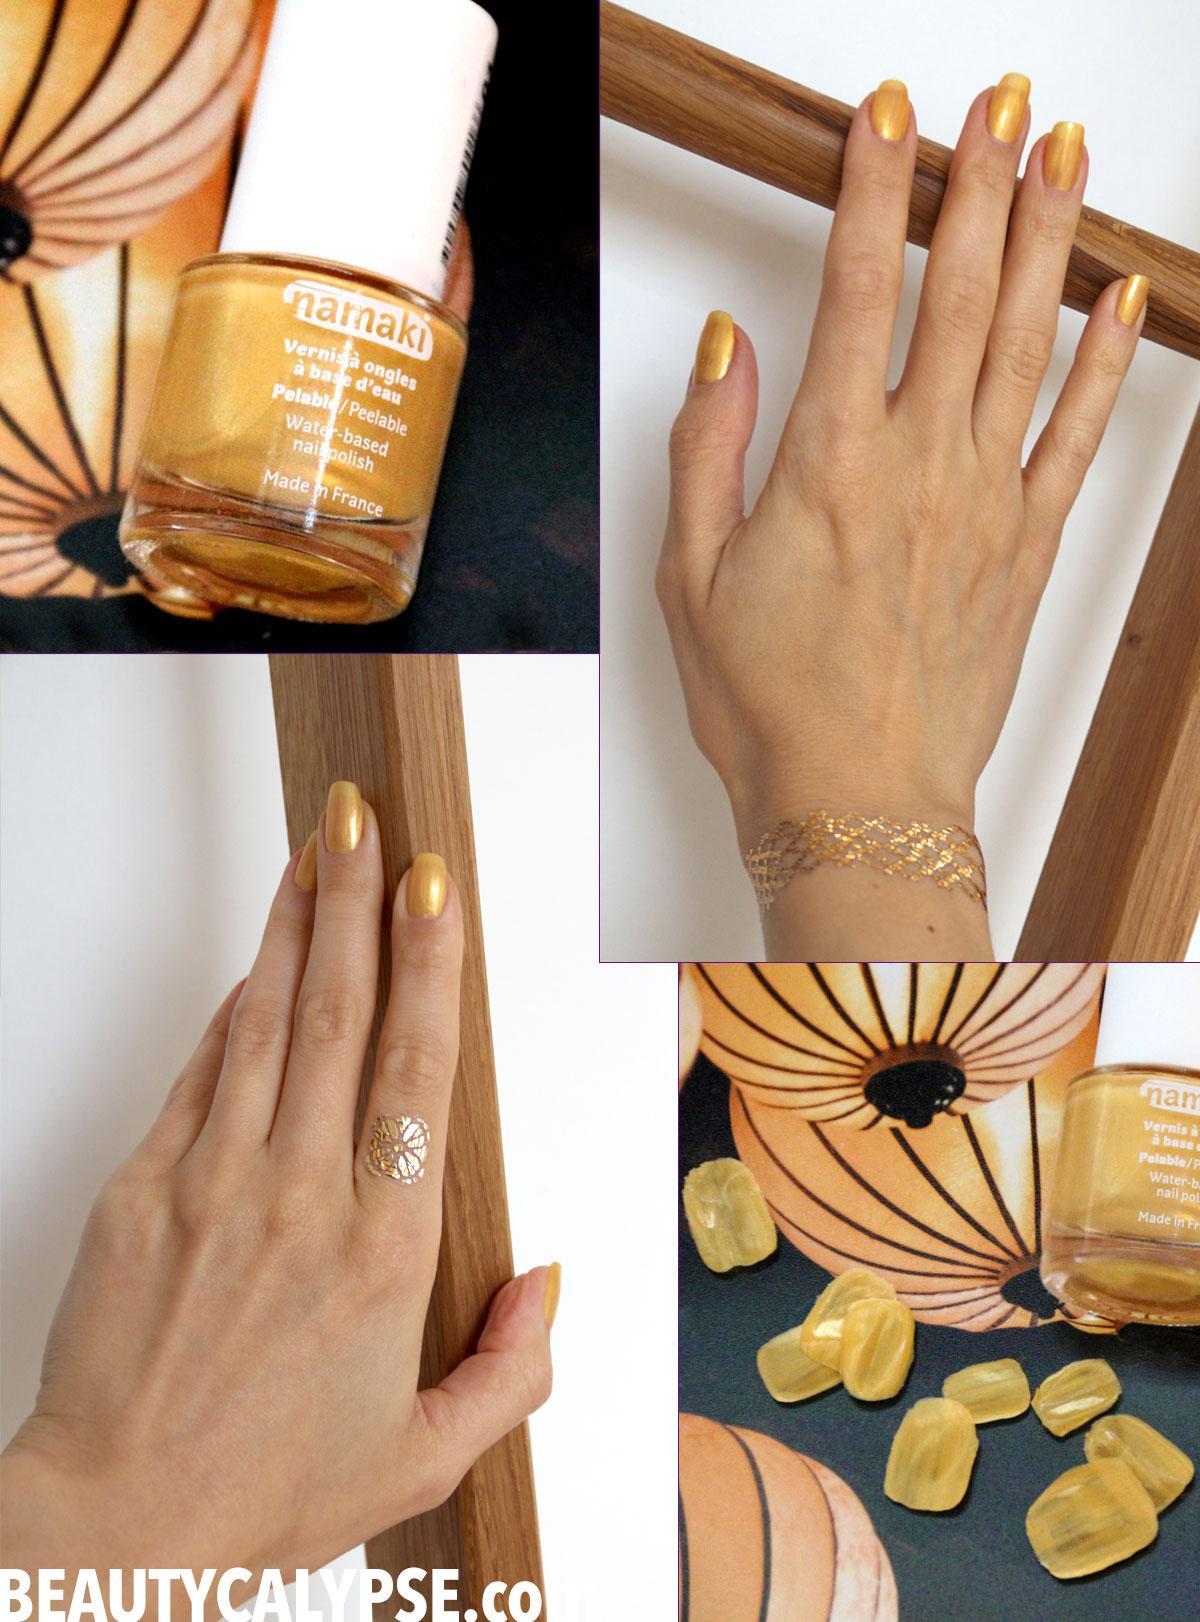 Water-Based & Peelable Nail Polish: Suncoat vs. Namaki * Product ...